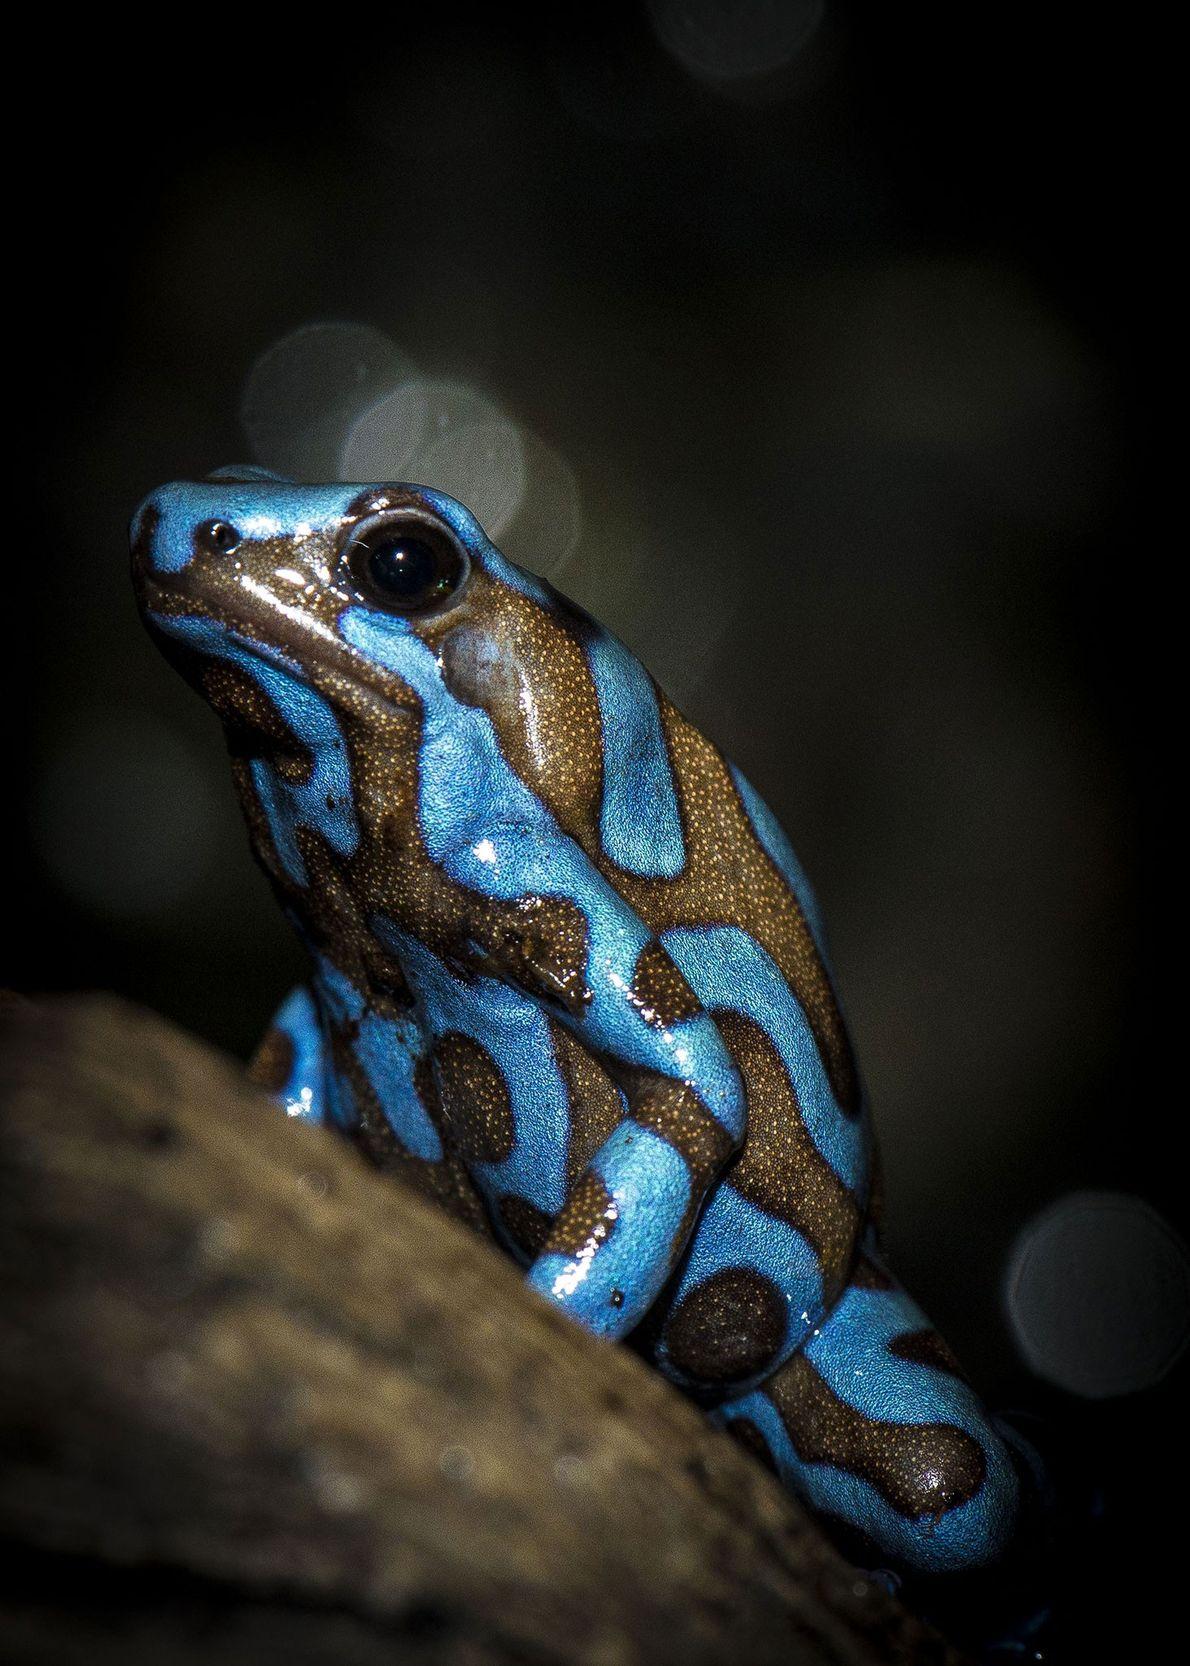 Poison dart frog. Houston, Texas, United States